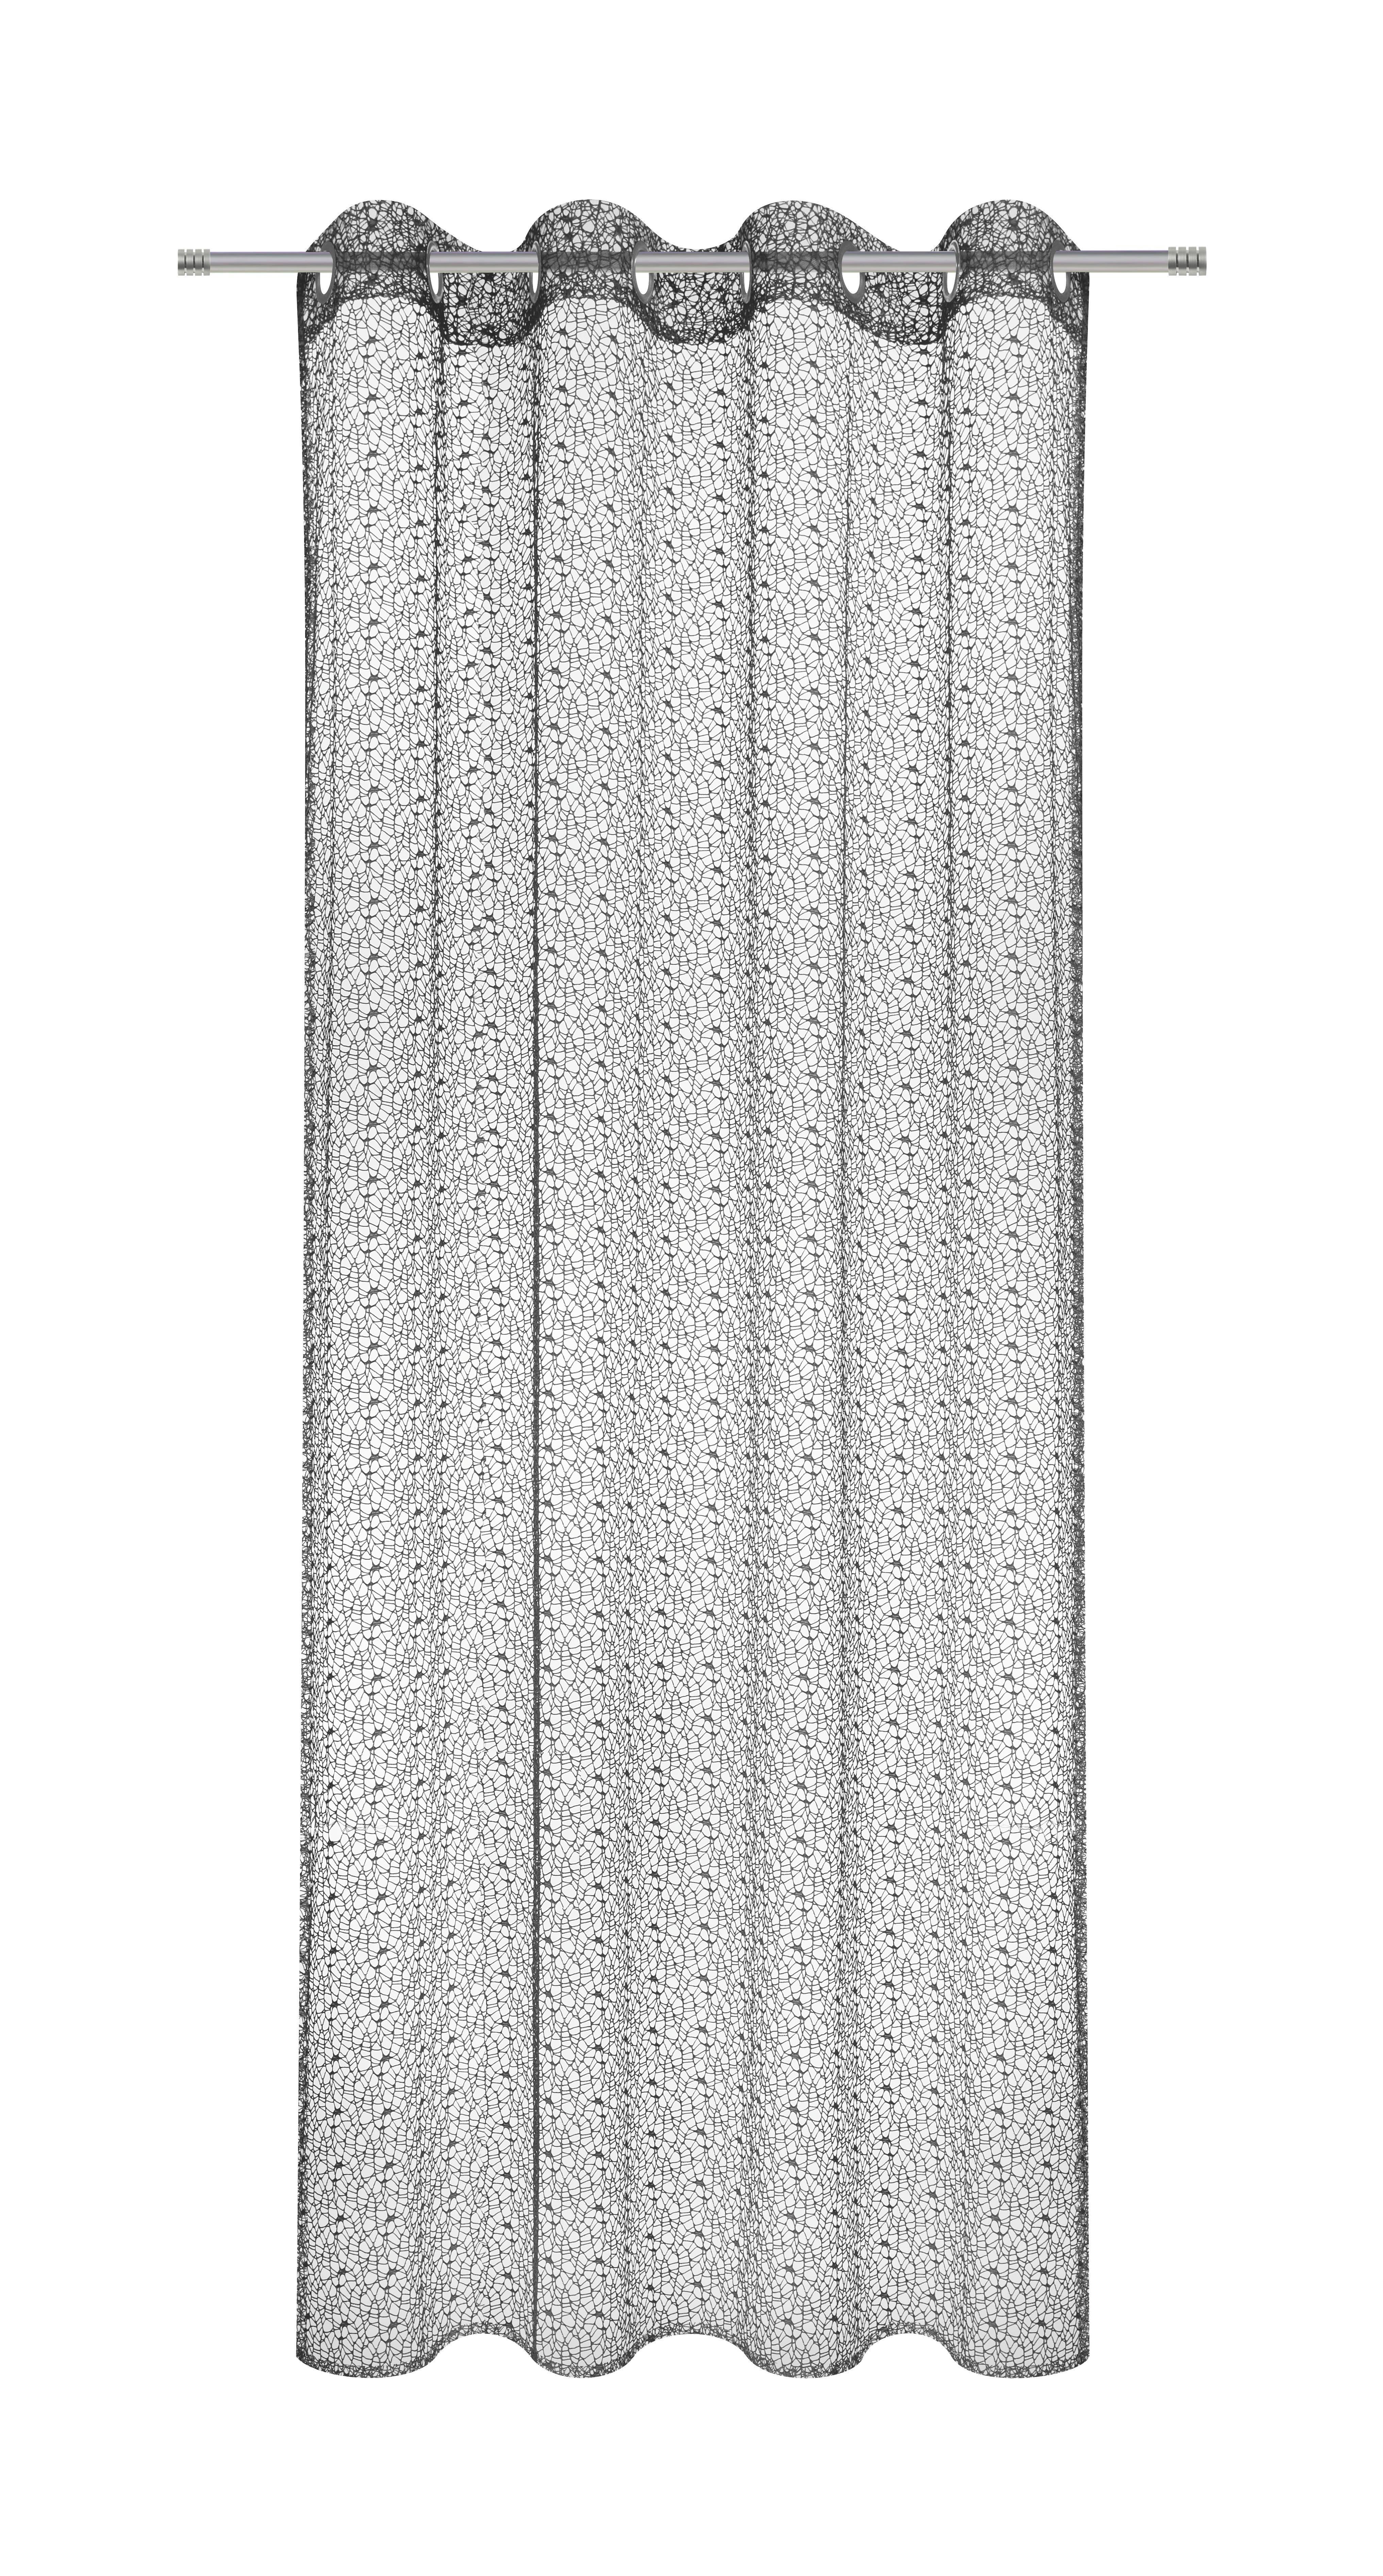 Ösenschal Astrid, ca. 140x245cm - Schwarz, MODERN, Textil (140/245cm) - MÖMAX modern living